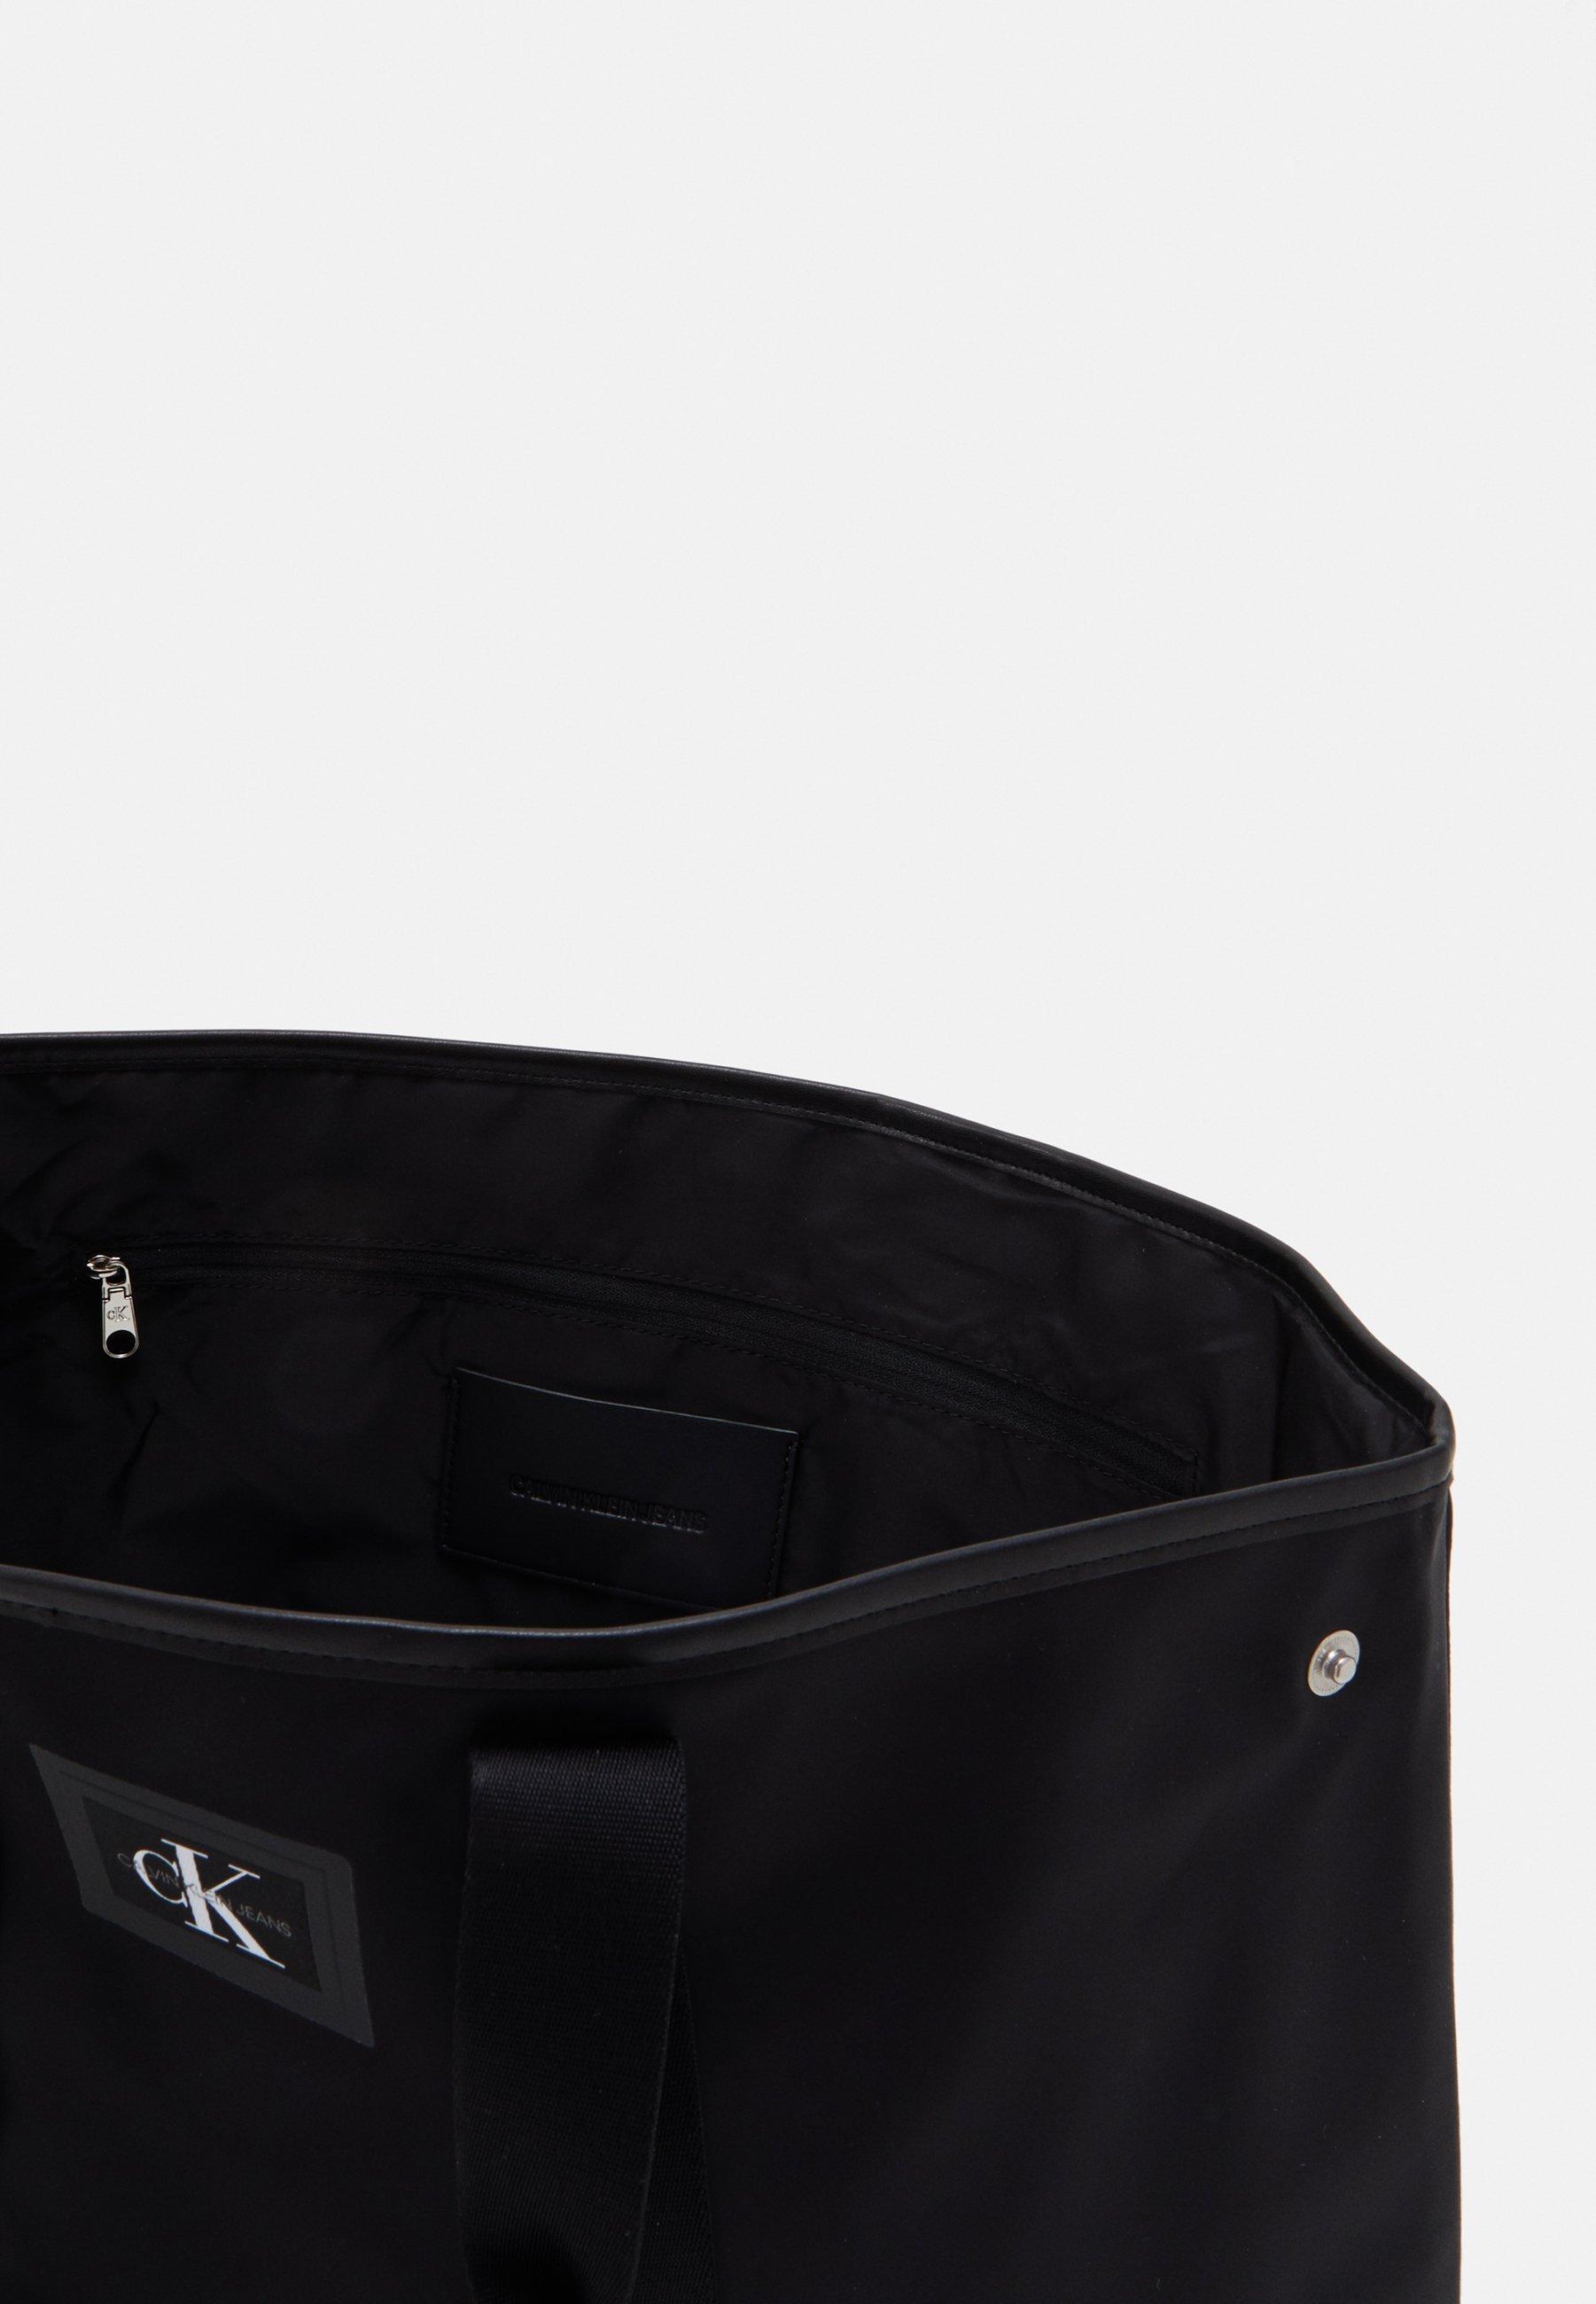 2020 New Shopping Online Accessories Calvin Klein Jeans SHOPPER Tote bag black YHYi99SXG pprBwjj2n